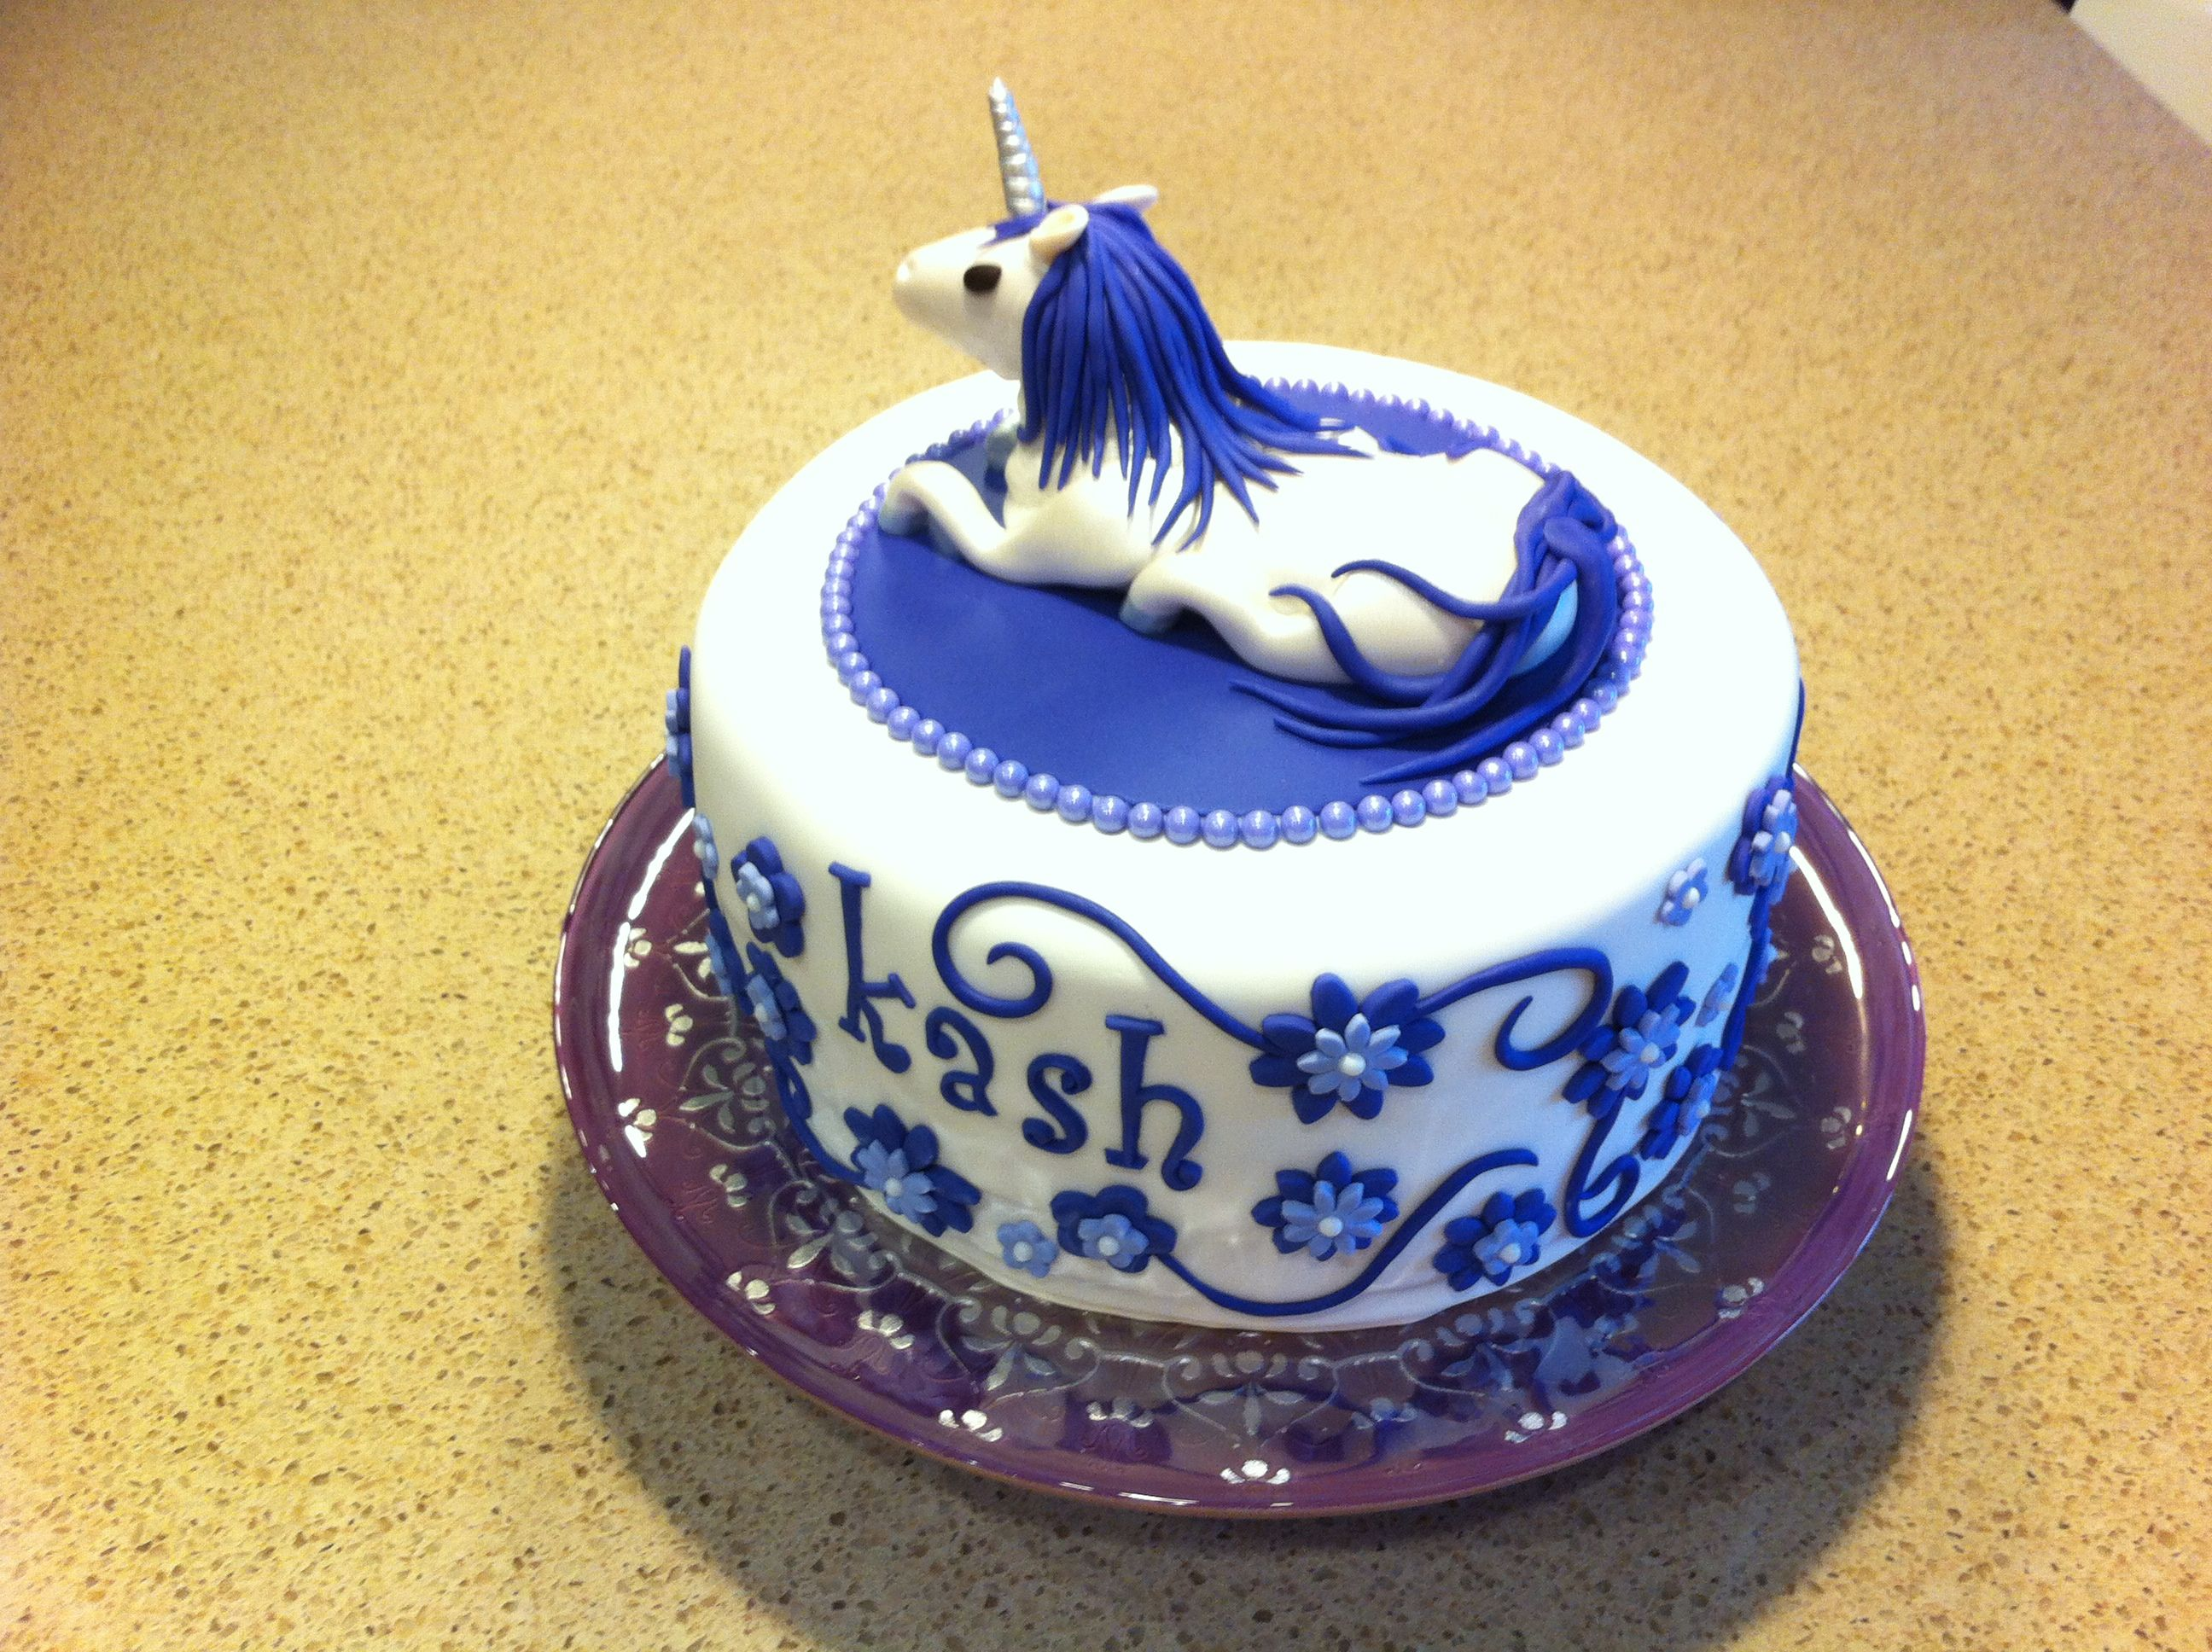 Birthday Cake For A 12 Year Old Girl So Fun Cake Ideas